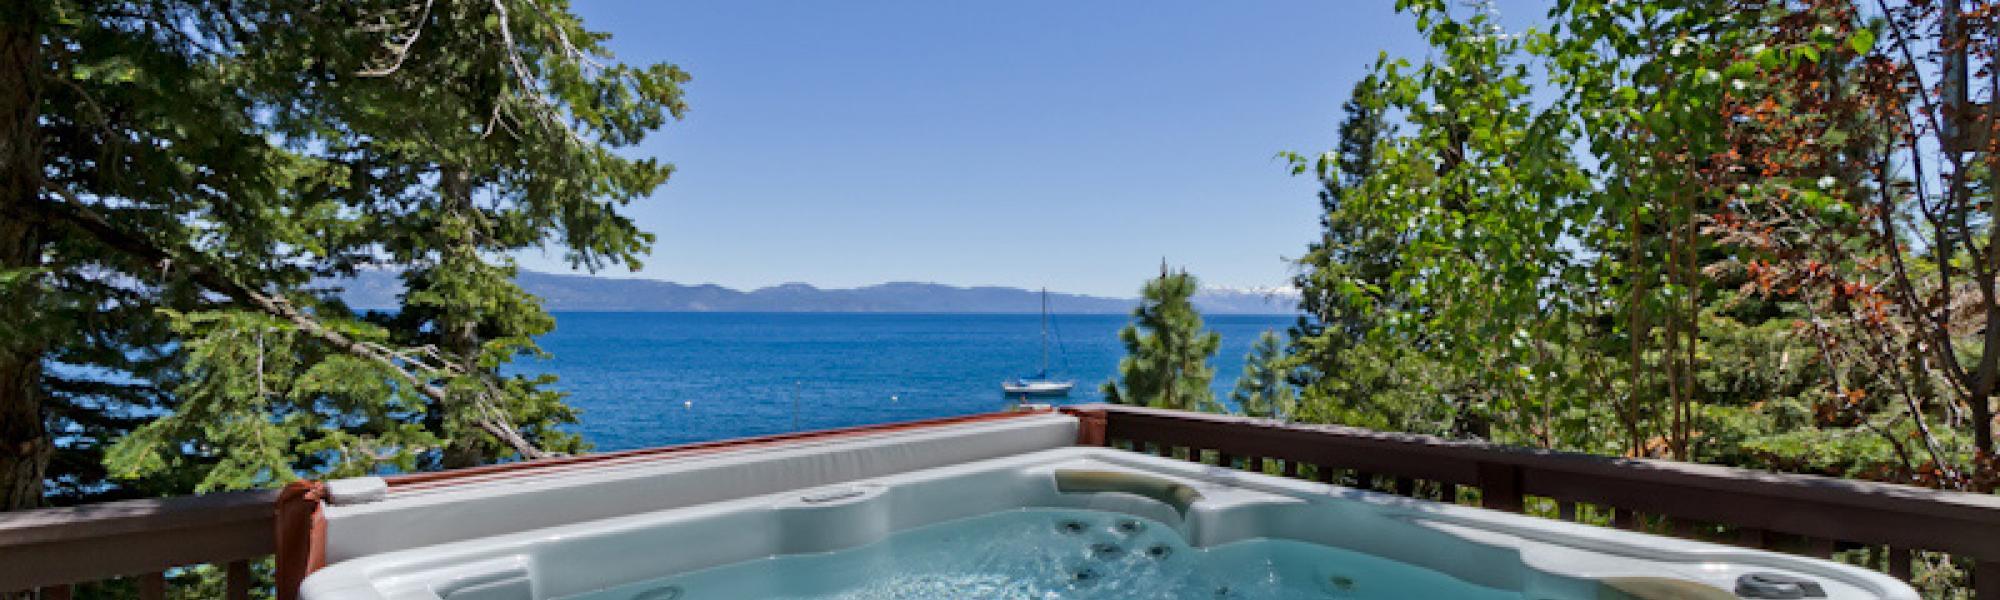 Tahoe Vacation Homes with Hot Tubs | Tahoe Luxury Properties